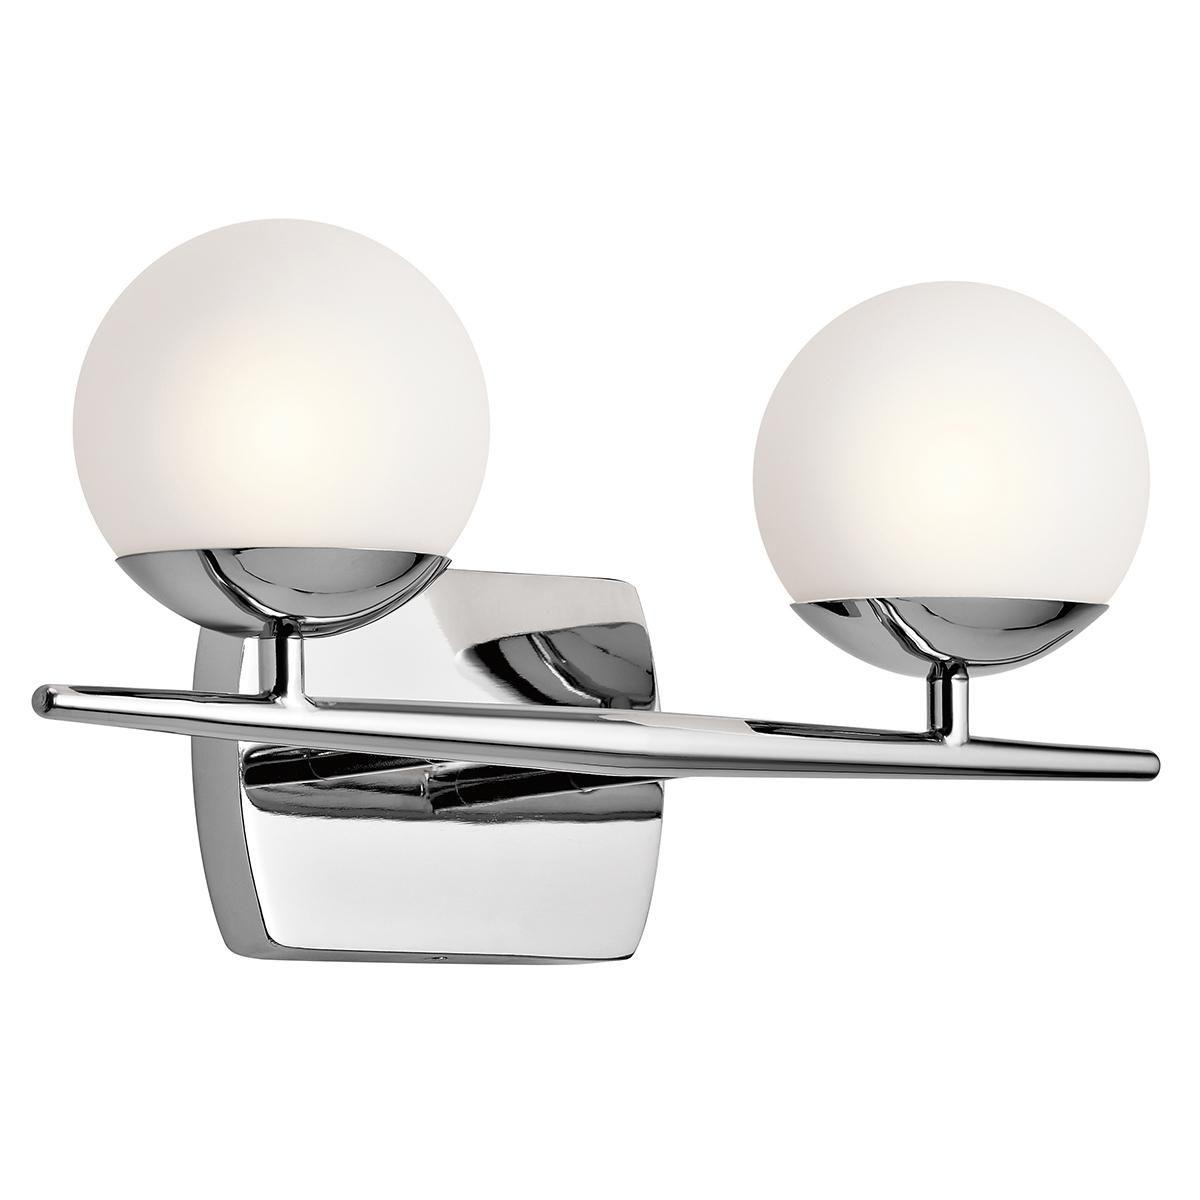 Linear Globe Bath Light Light Pinterest Bath Light Globe - Linear bathroom lighting